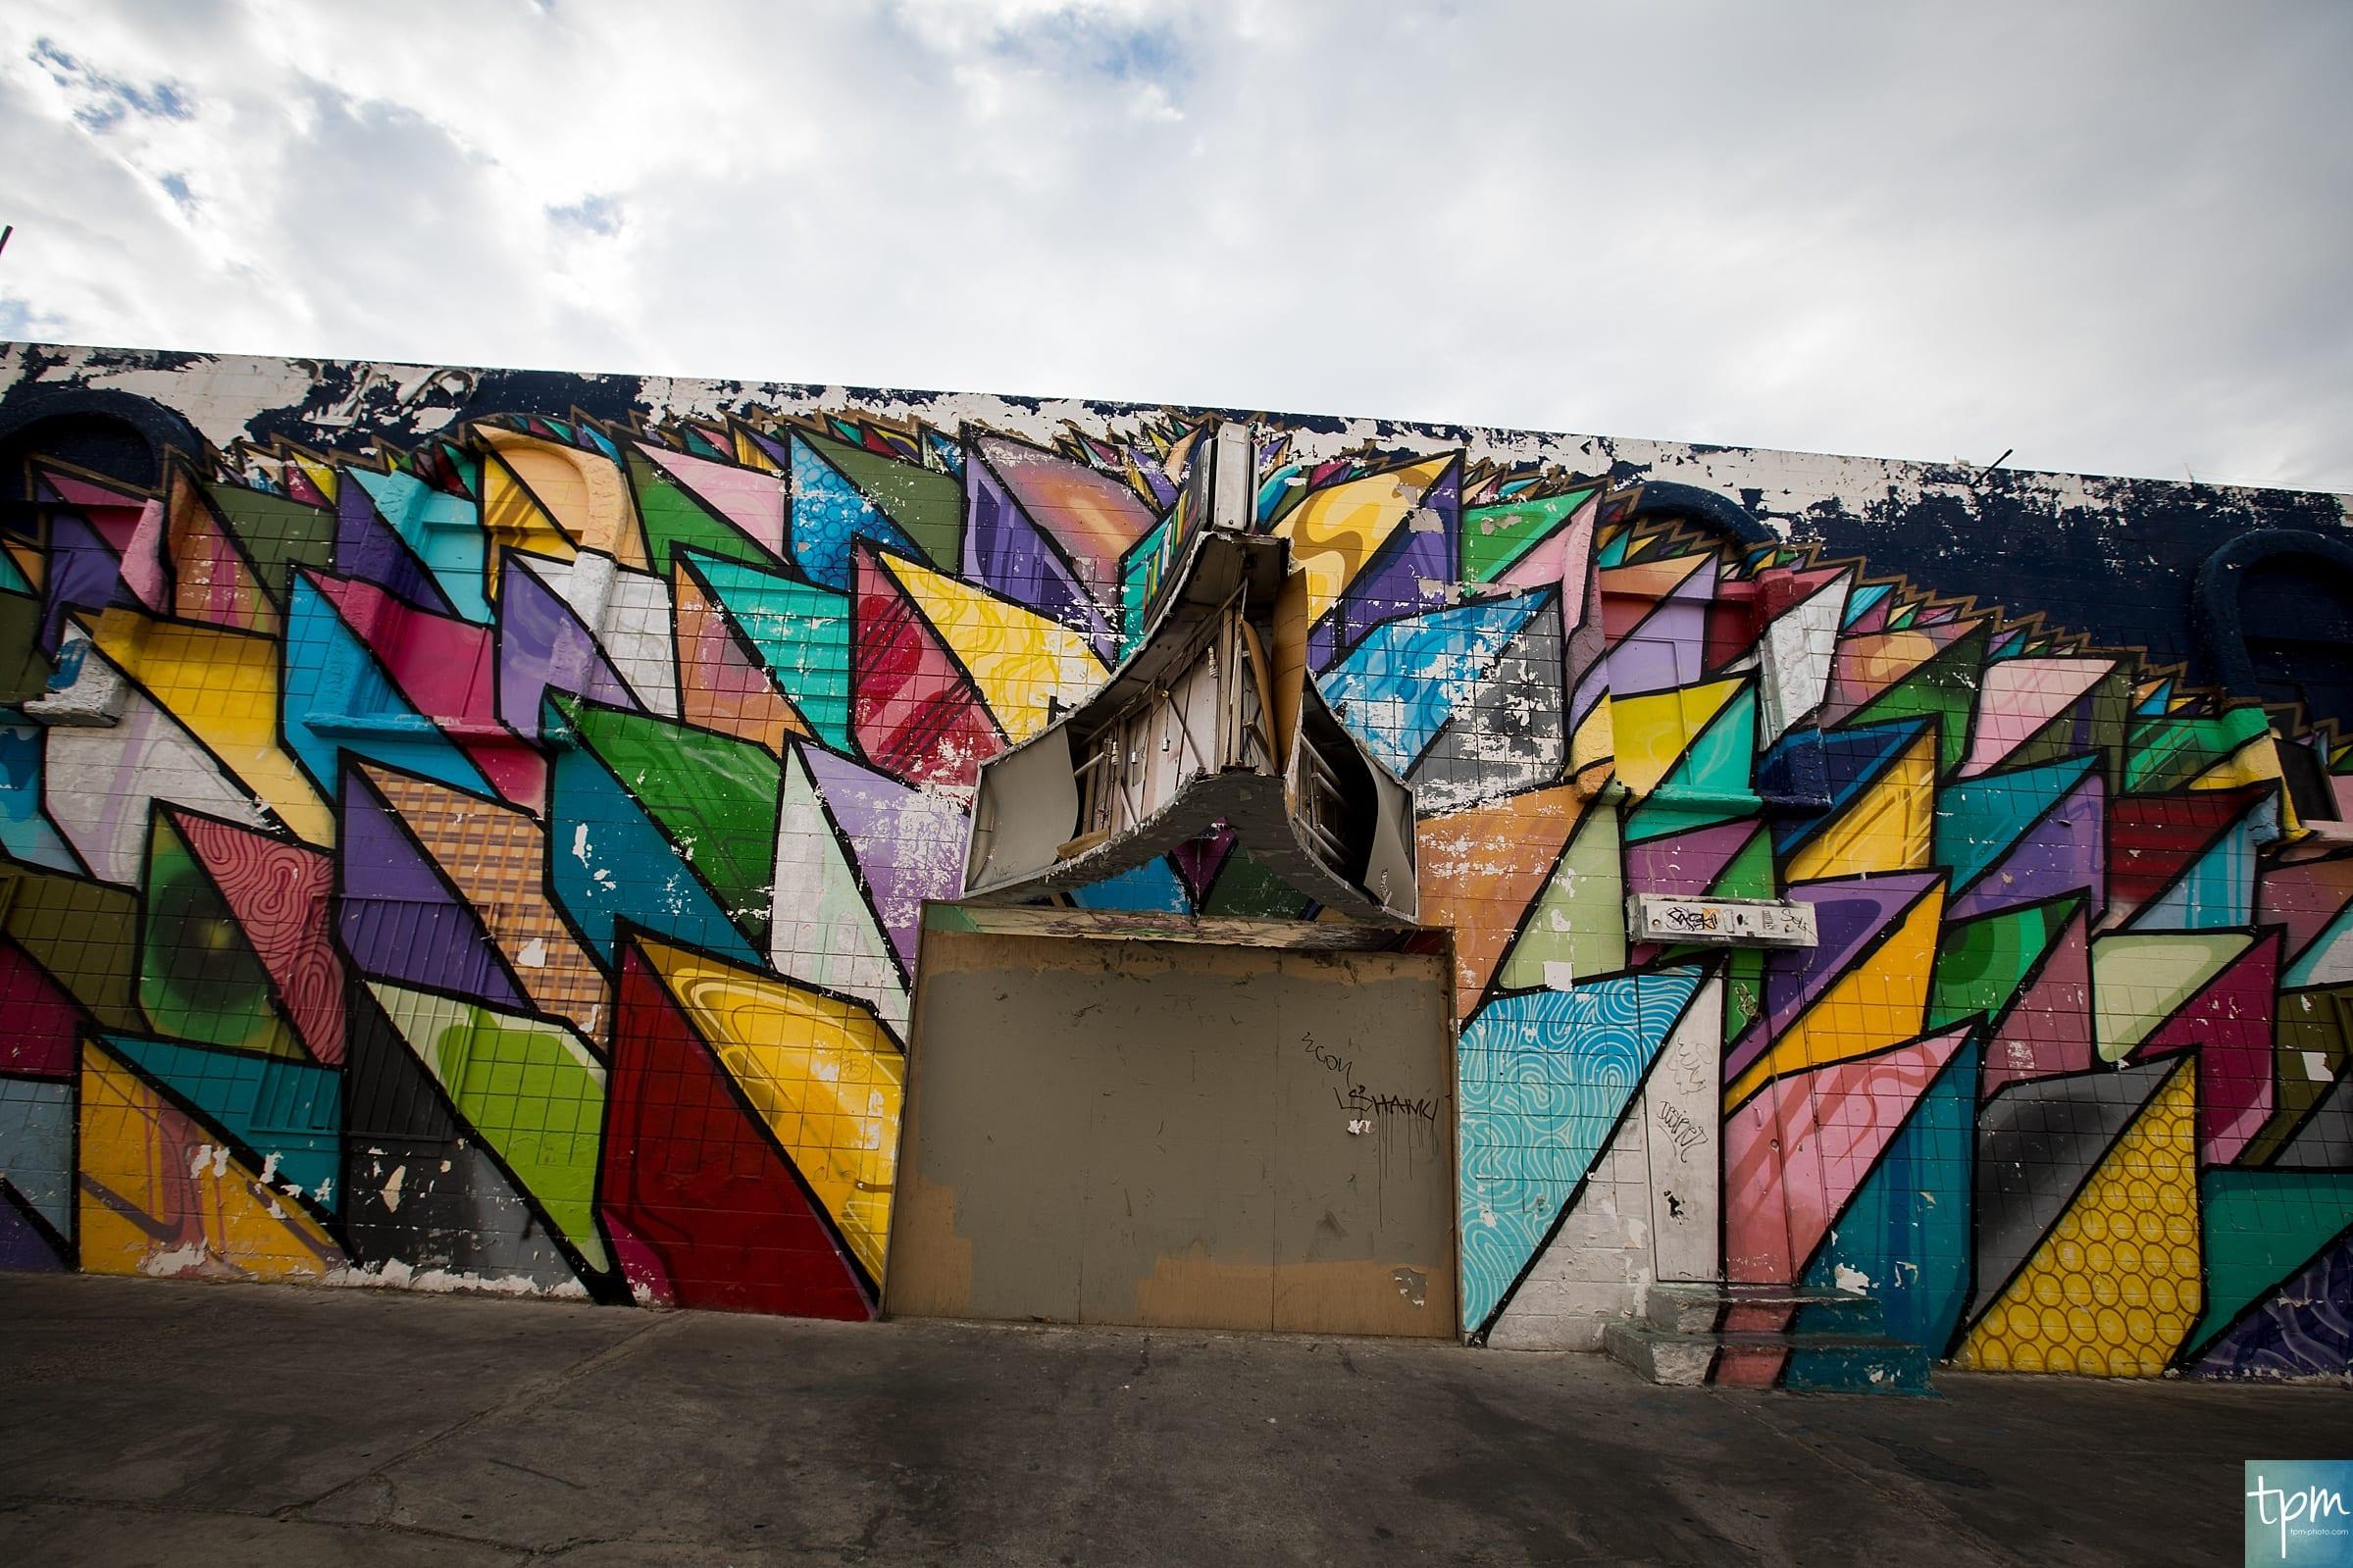 Apexer, 7th Street, Taylored Photo Memories, Las Vegas Murals